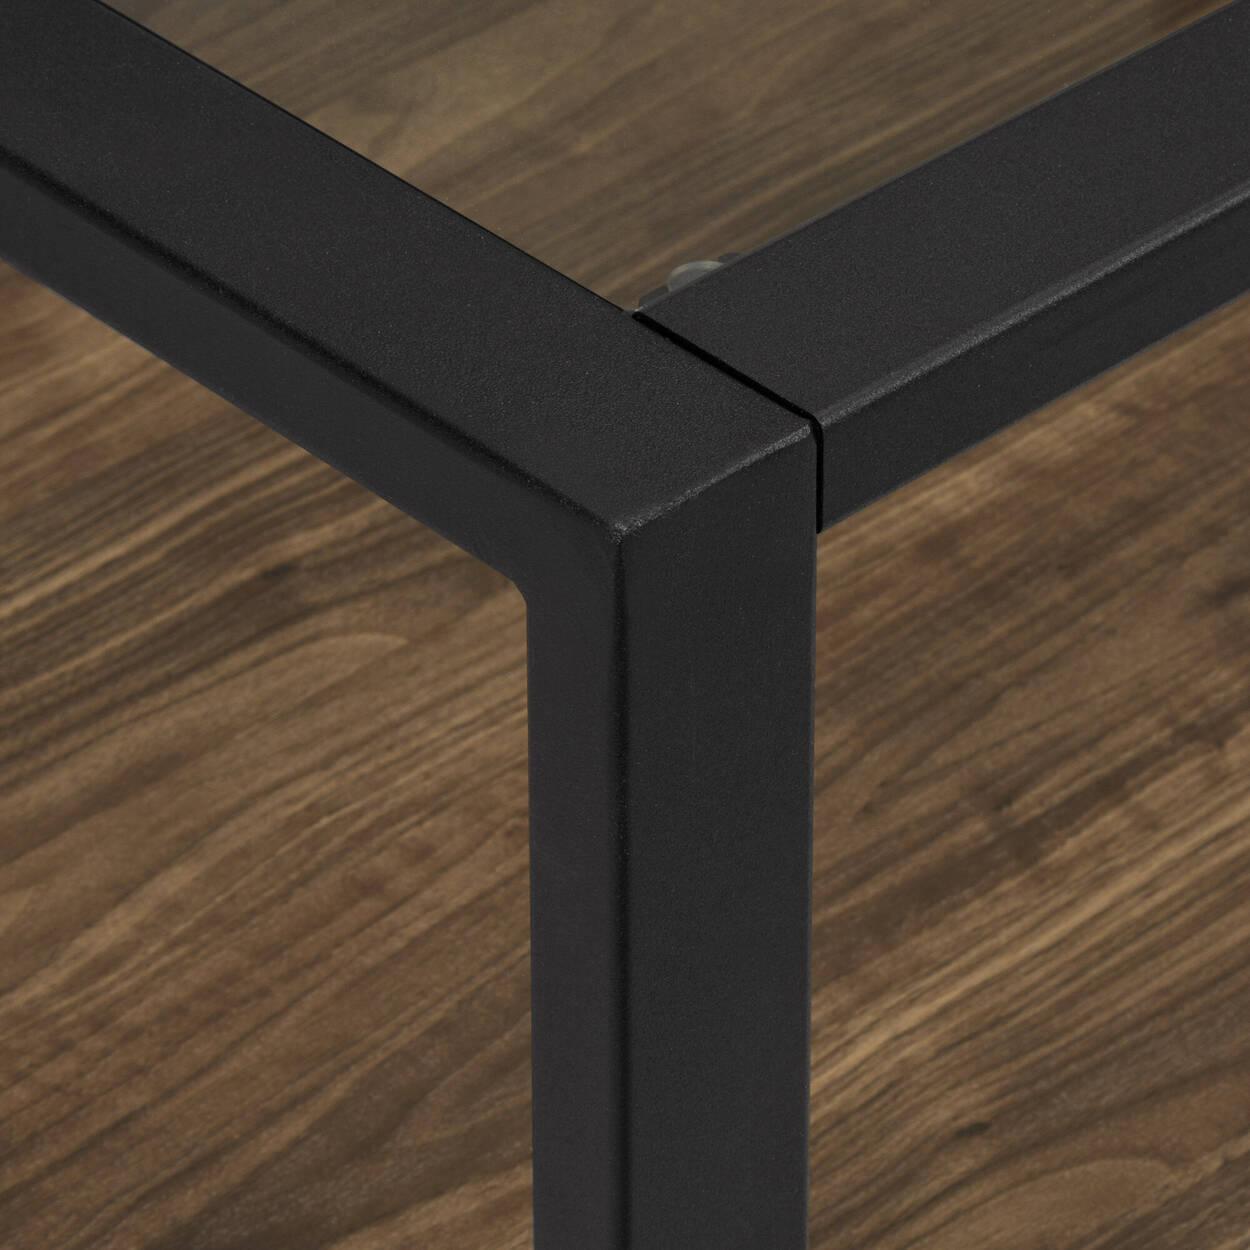 Table basse en verre, en fer et en placage